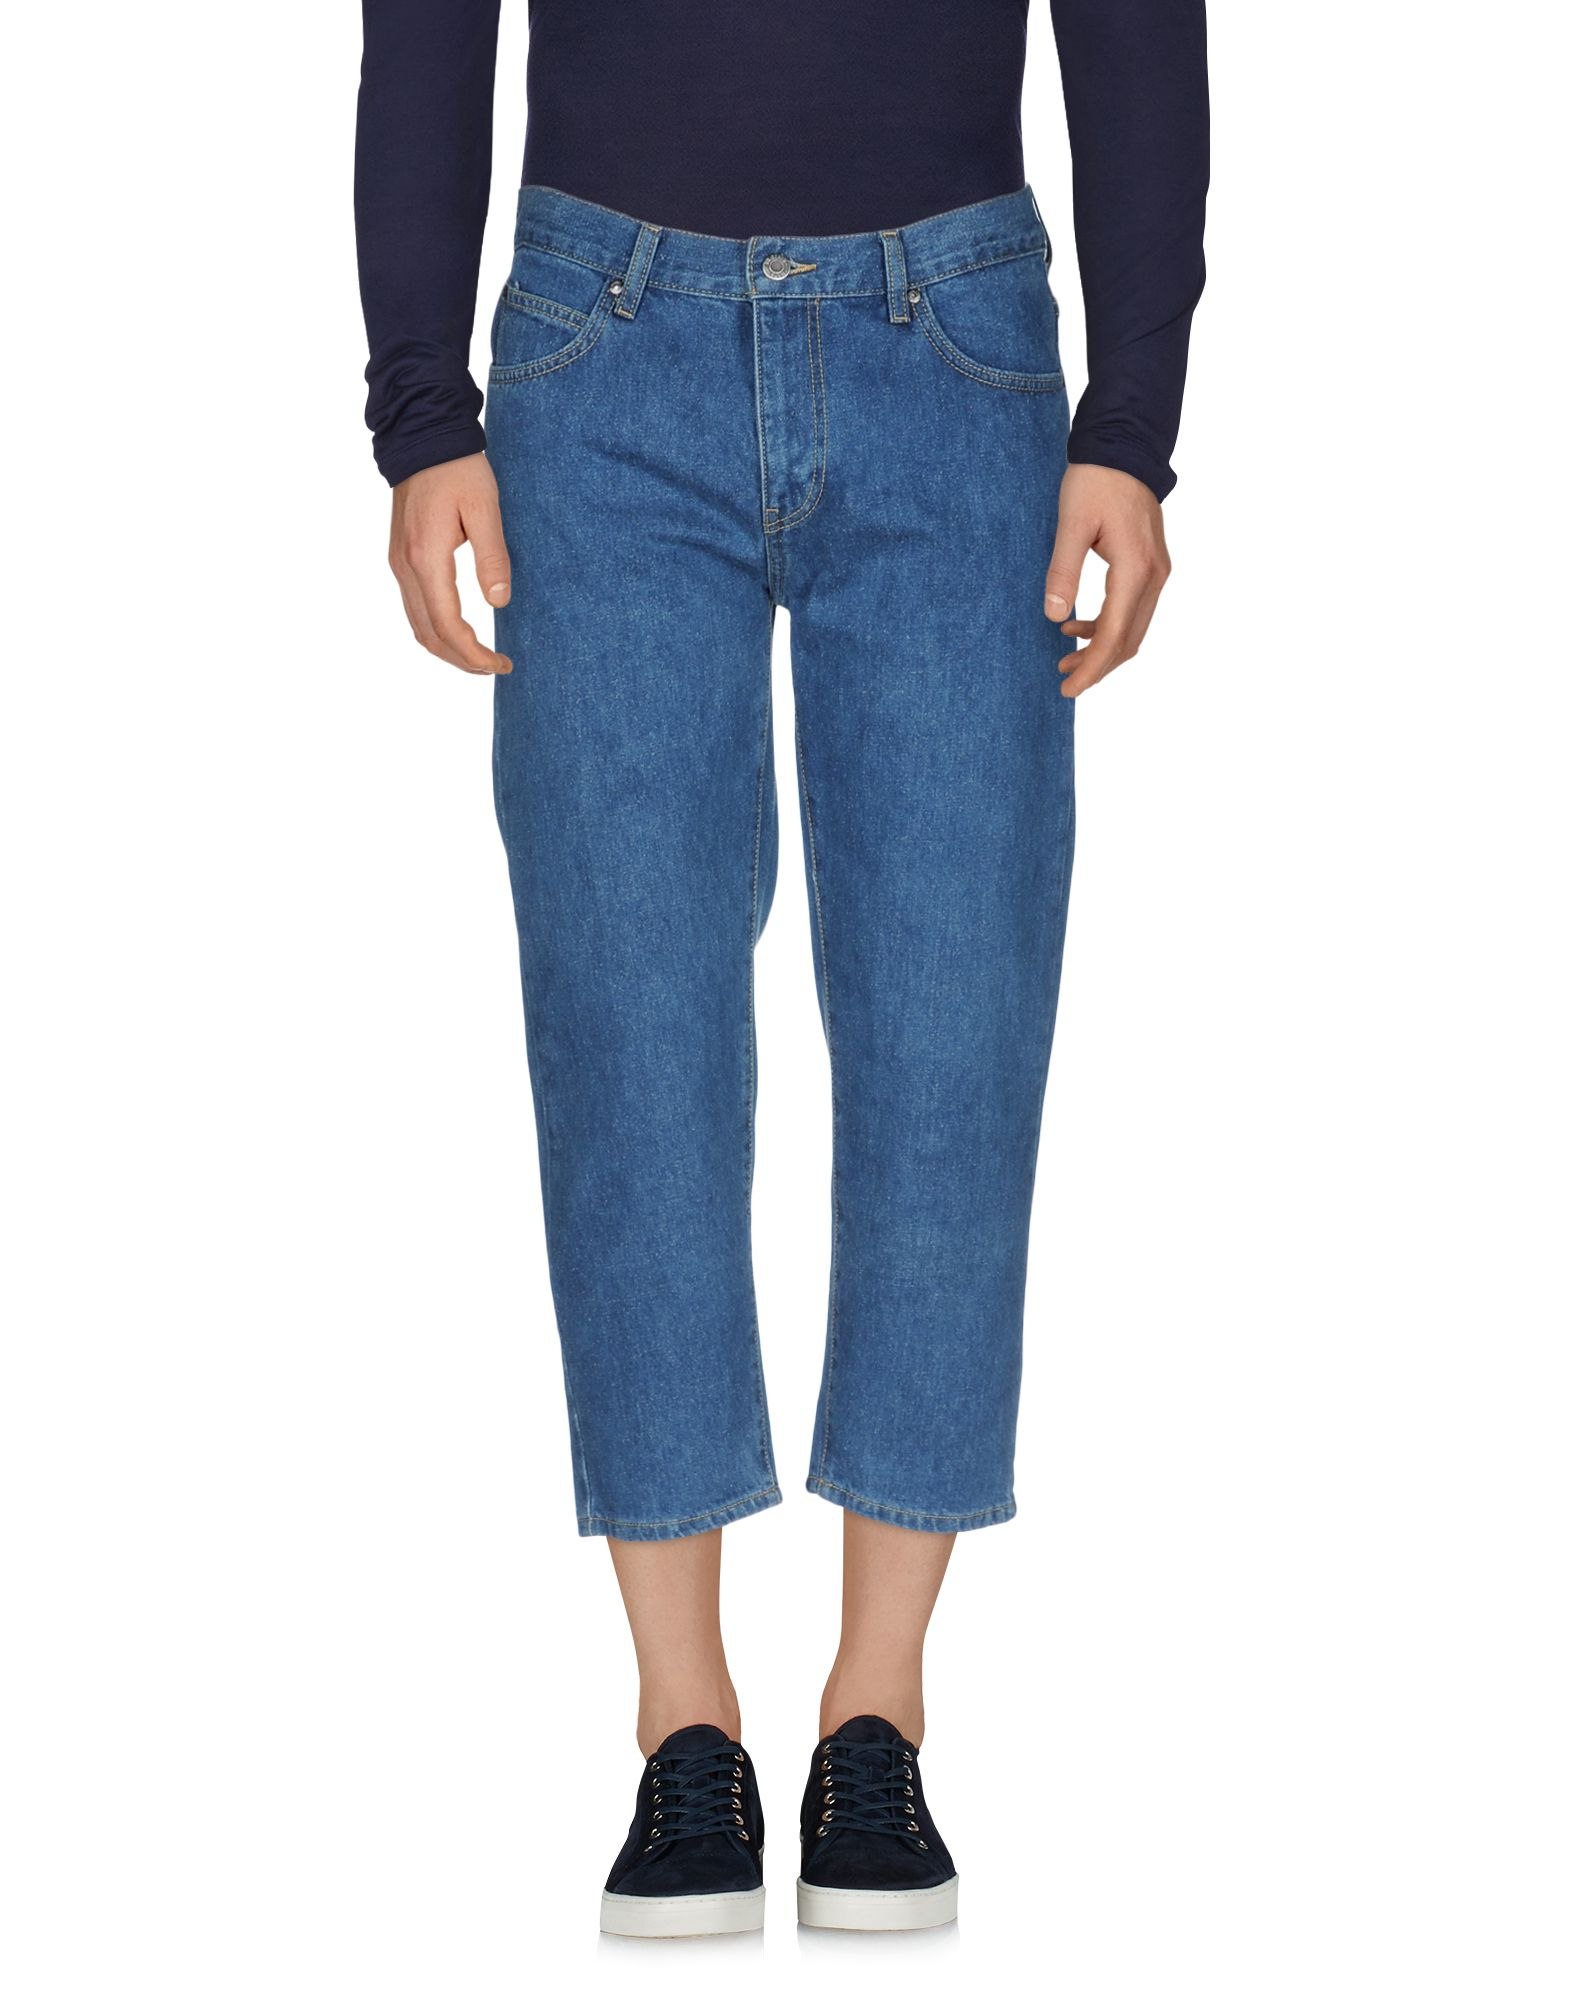 DR. DENIM JEANSMAKERS Джинсовые брюки dr denim jeansmakers